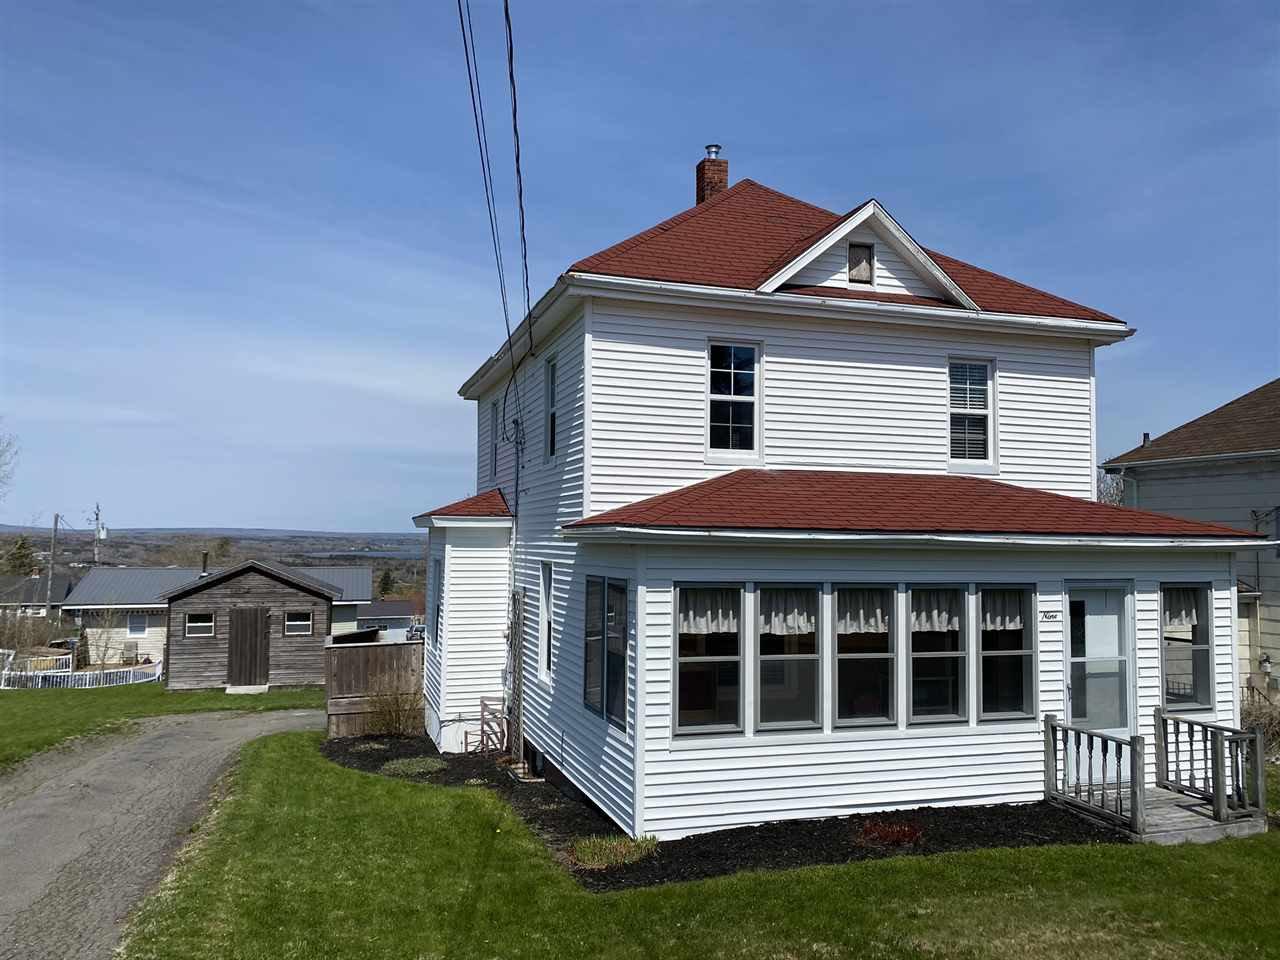 Main Photo: 9 Elm Street in Trenton: 107-Trenton,Westville,Pictou Residential for sale (Northern Region)  : MLS®# 202008229